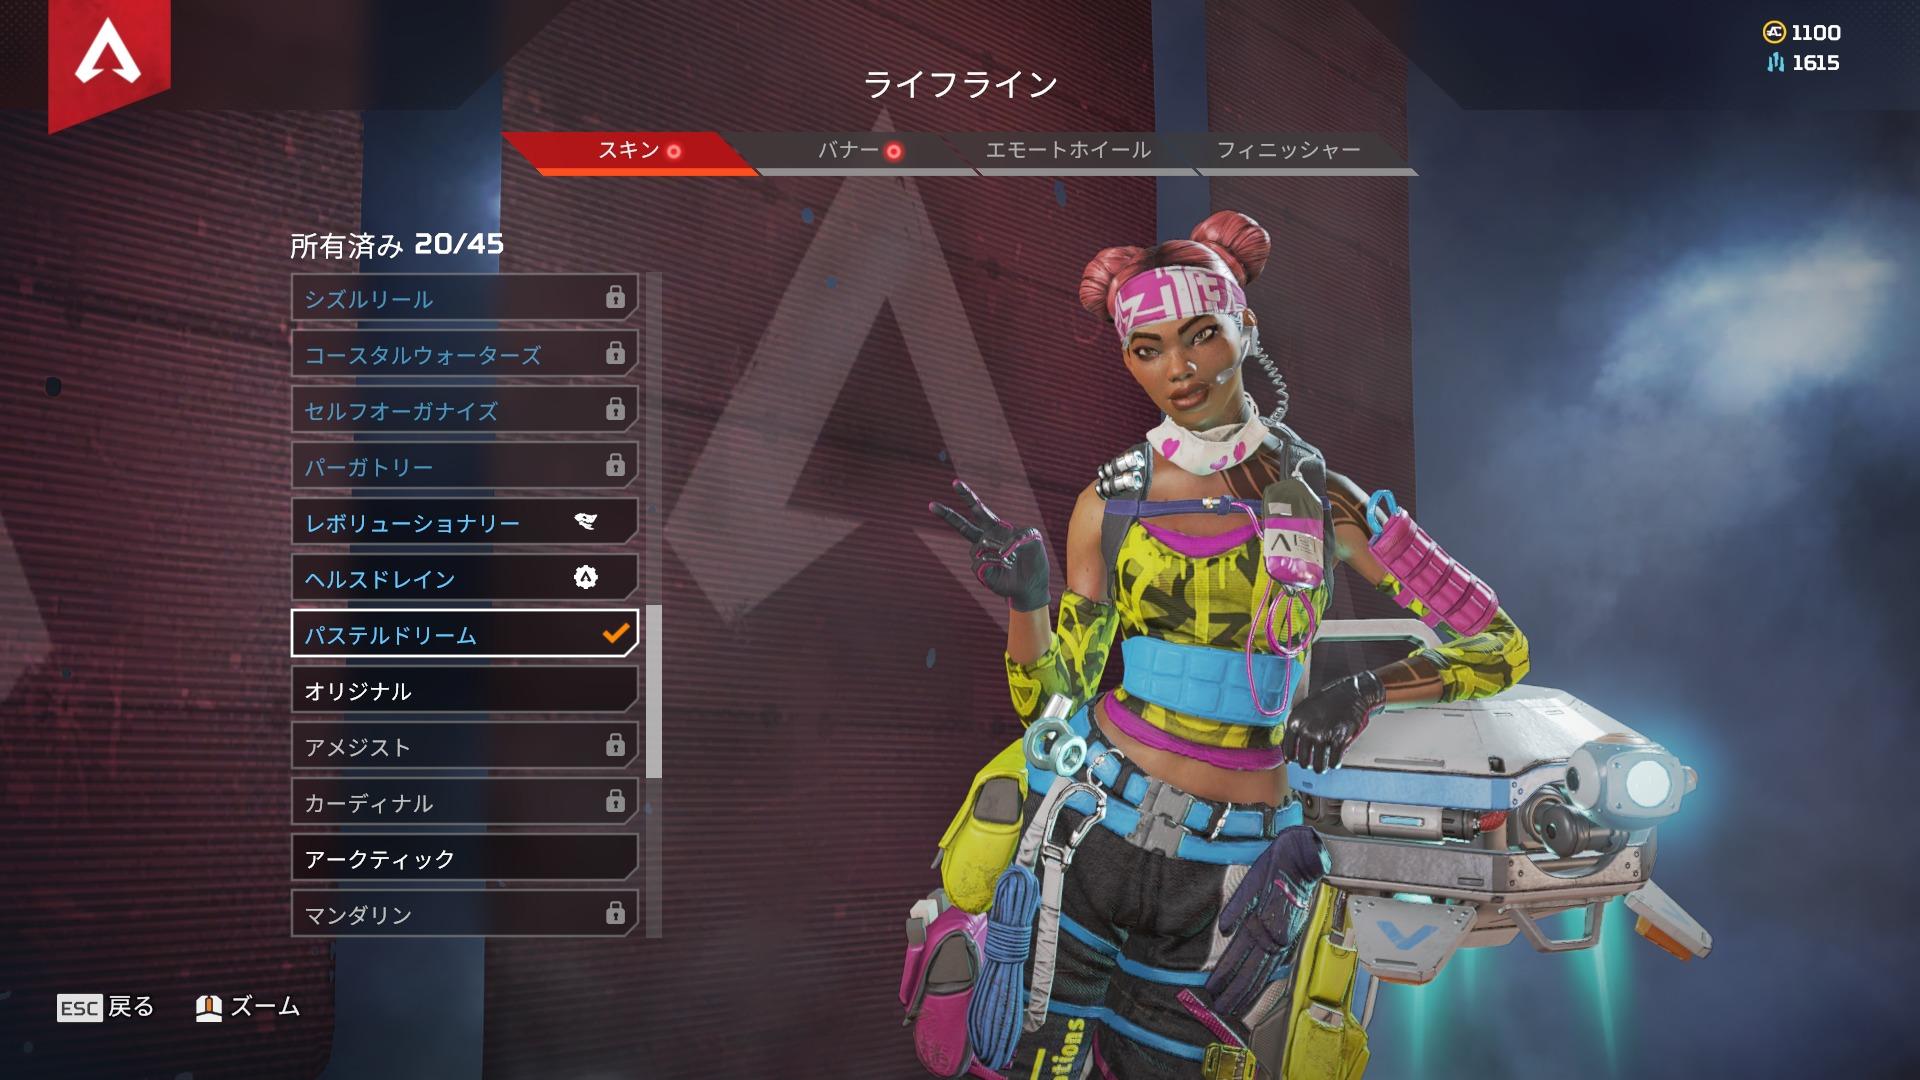 【APEX】ライフラインのTwitchプライム限定スキンが登場!!